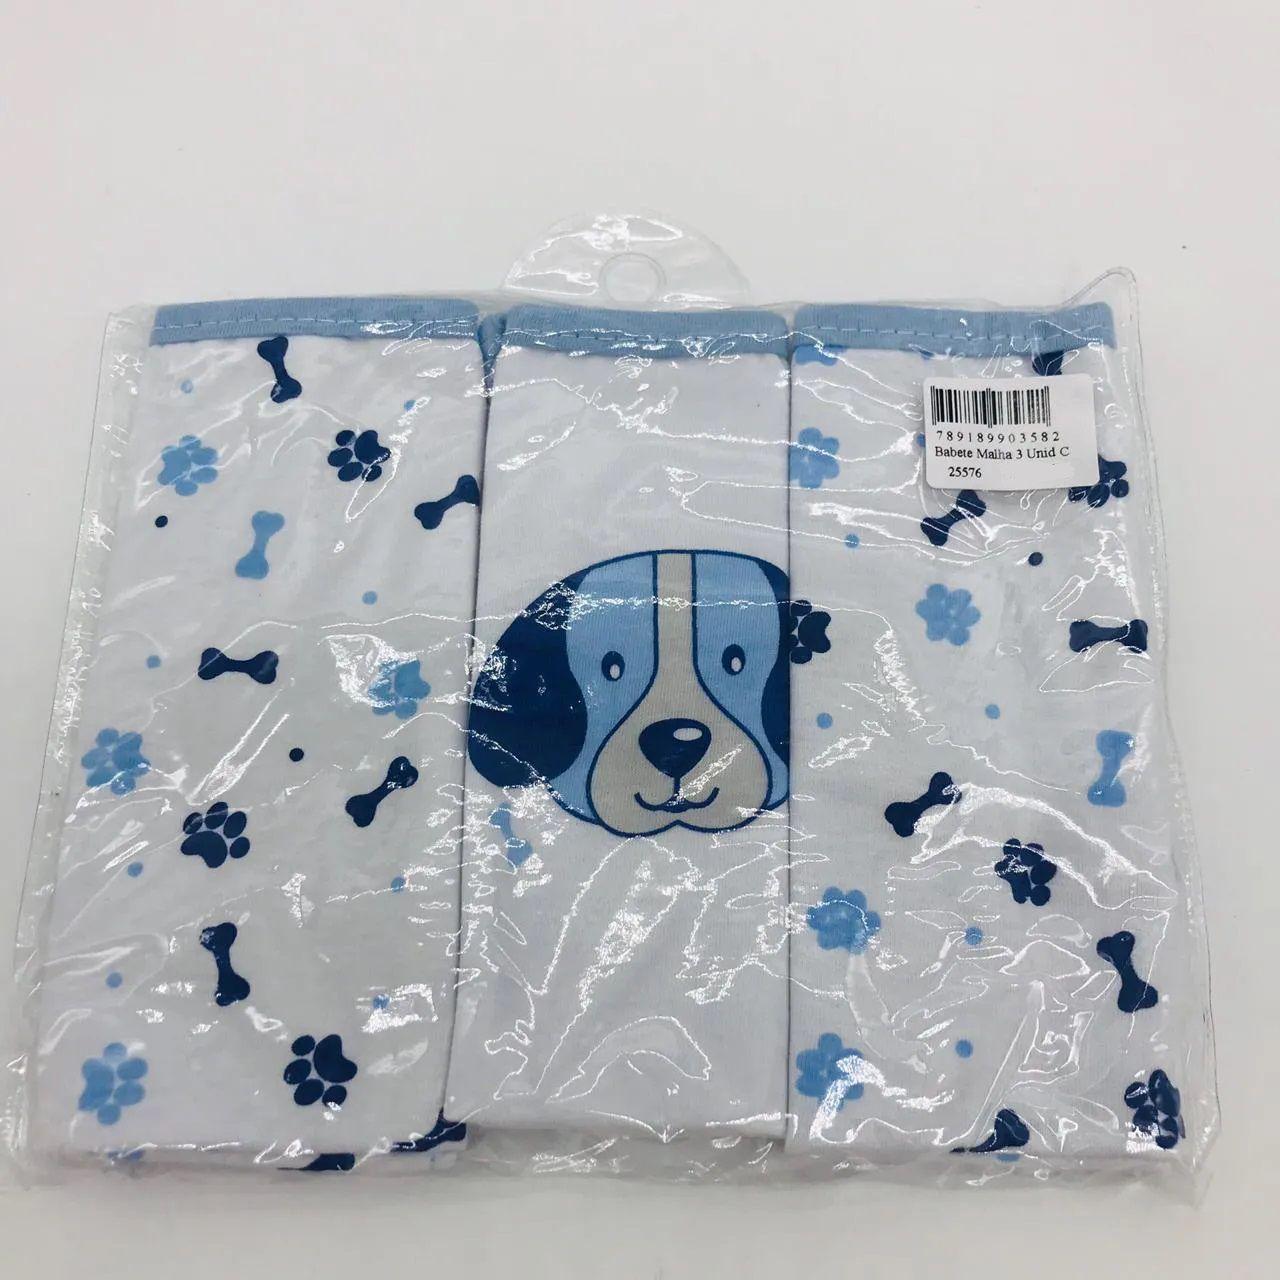 Babete Malha 3 Unid Cachorro Carinhas 25x30 - Minasrey Ref 3582